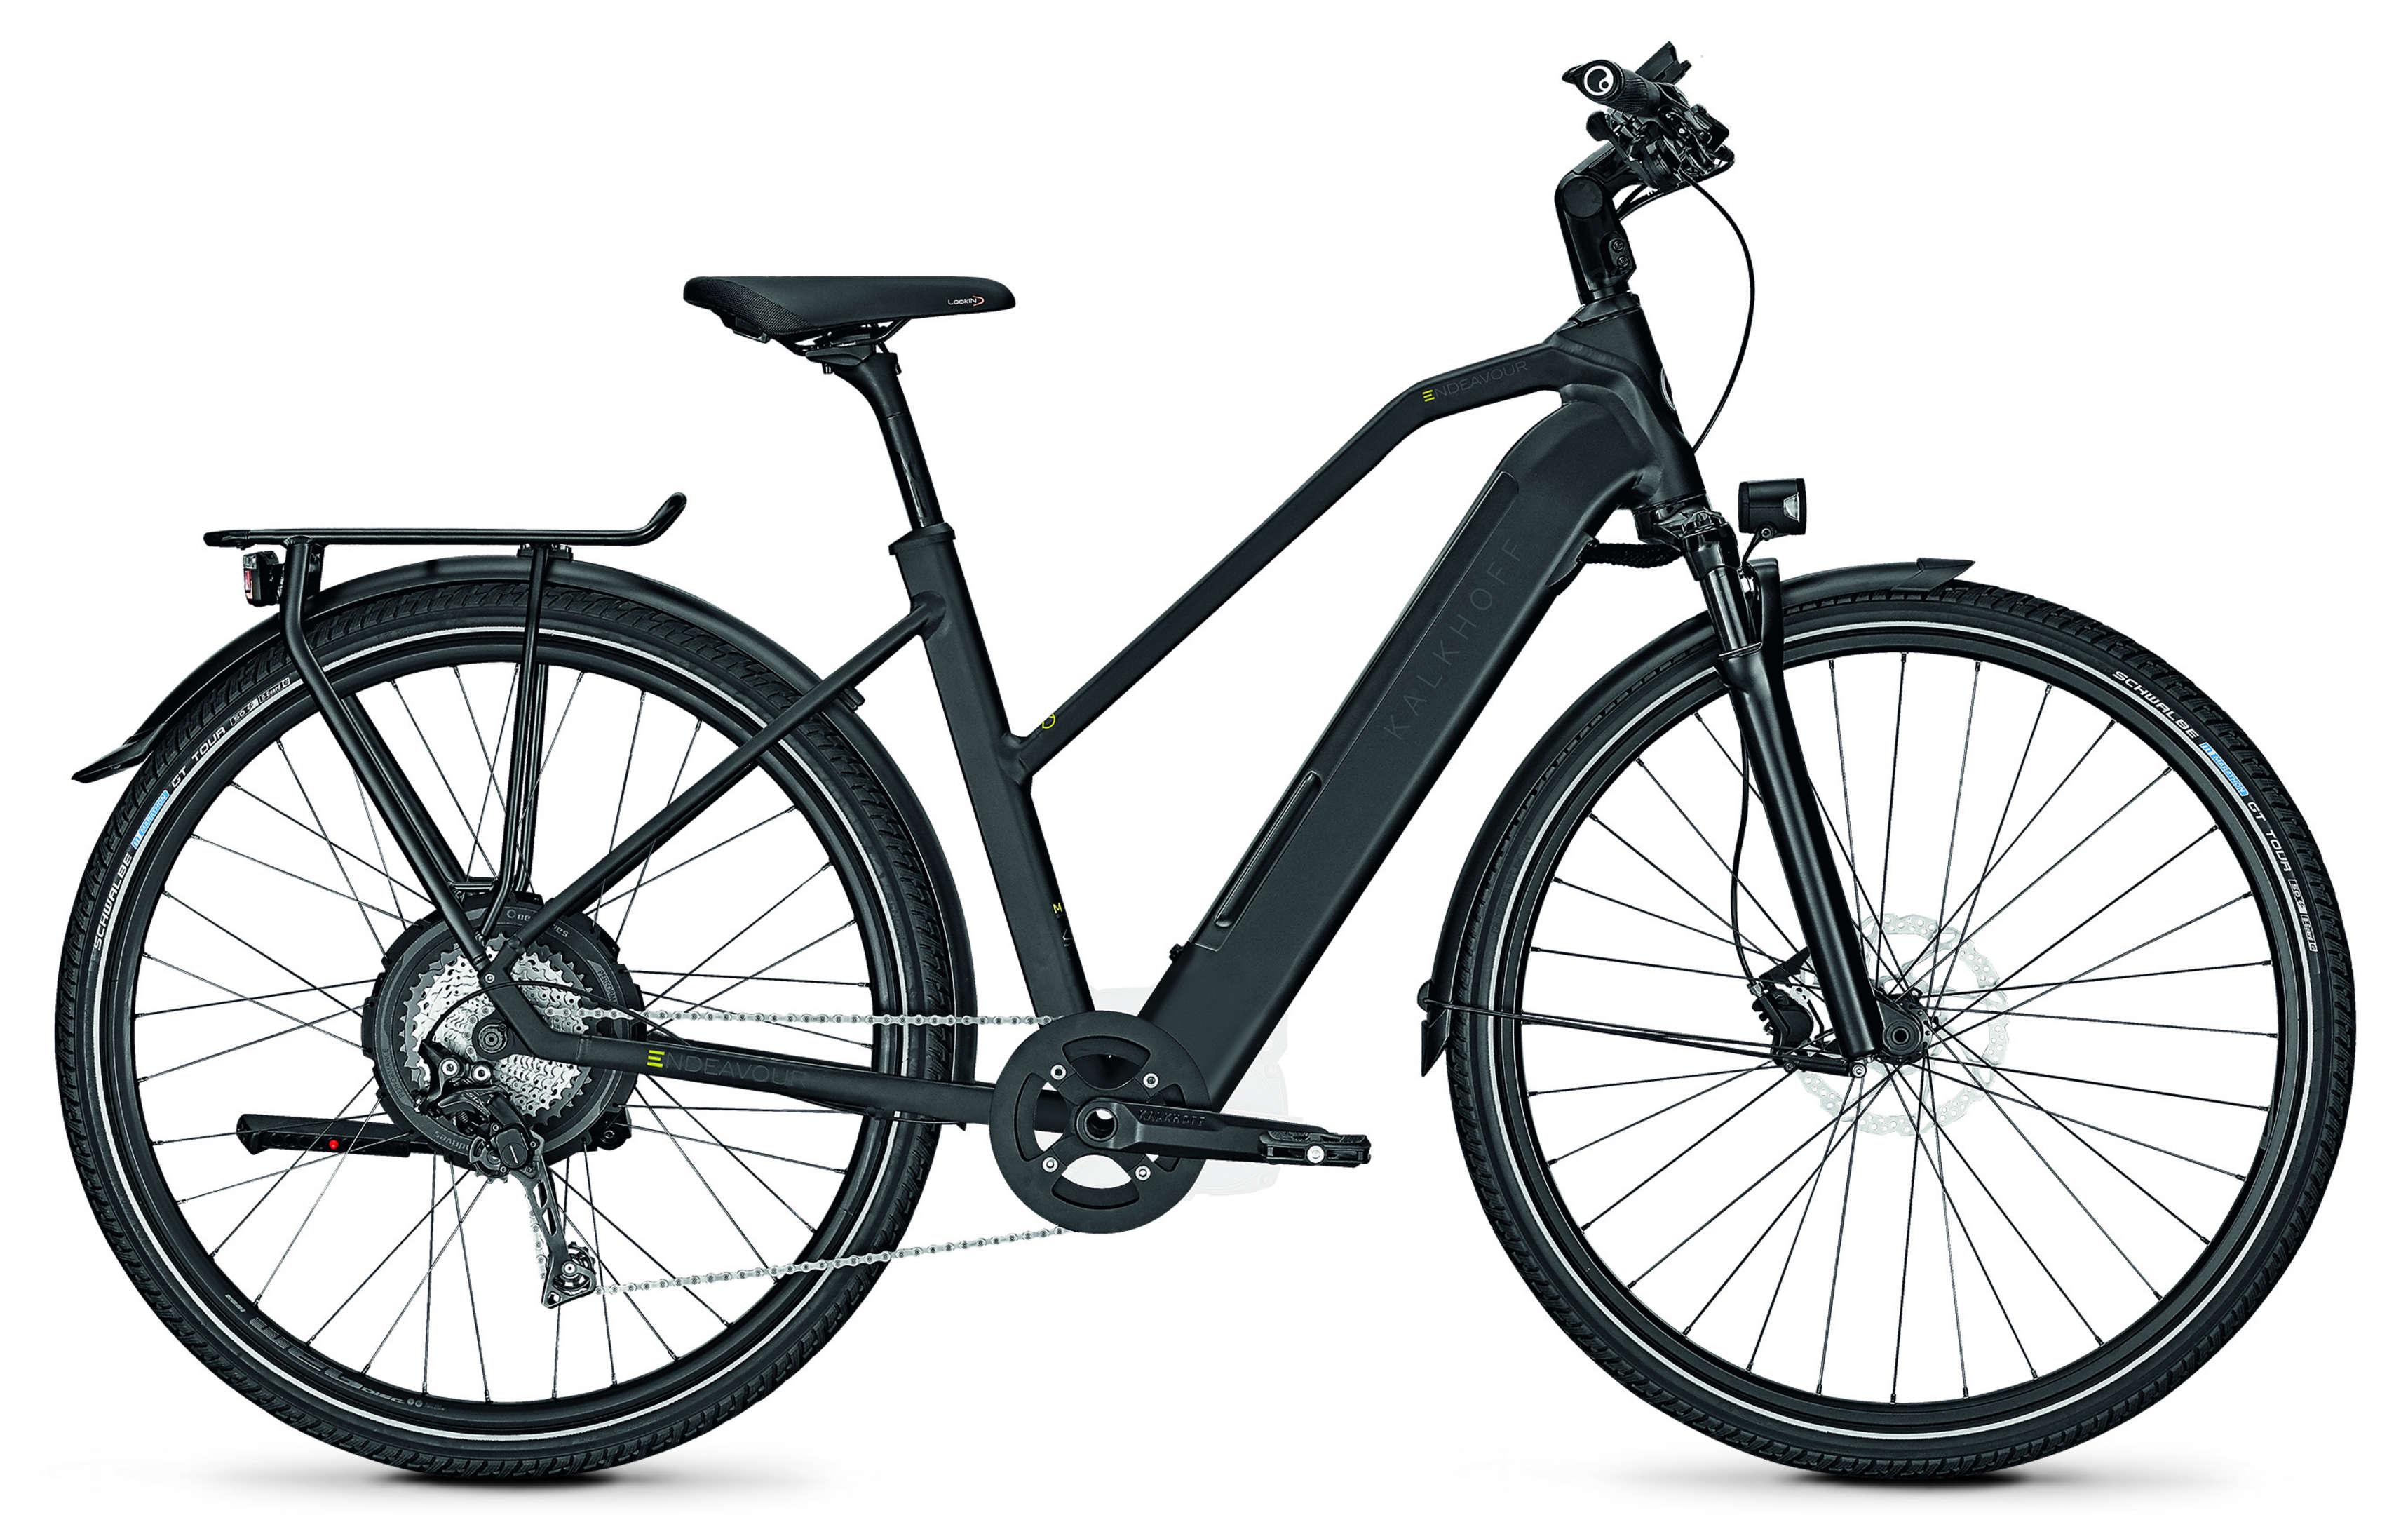 kalkhoff e trekking endeavour advance n10 15 0ah 3 eurorad bikeleasingeurorad bikeleasing. Black Bedroom Furniture Sets. Home Design Ideas